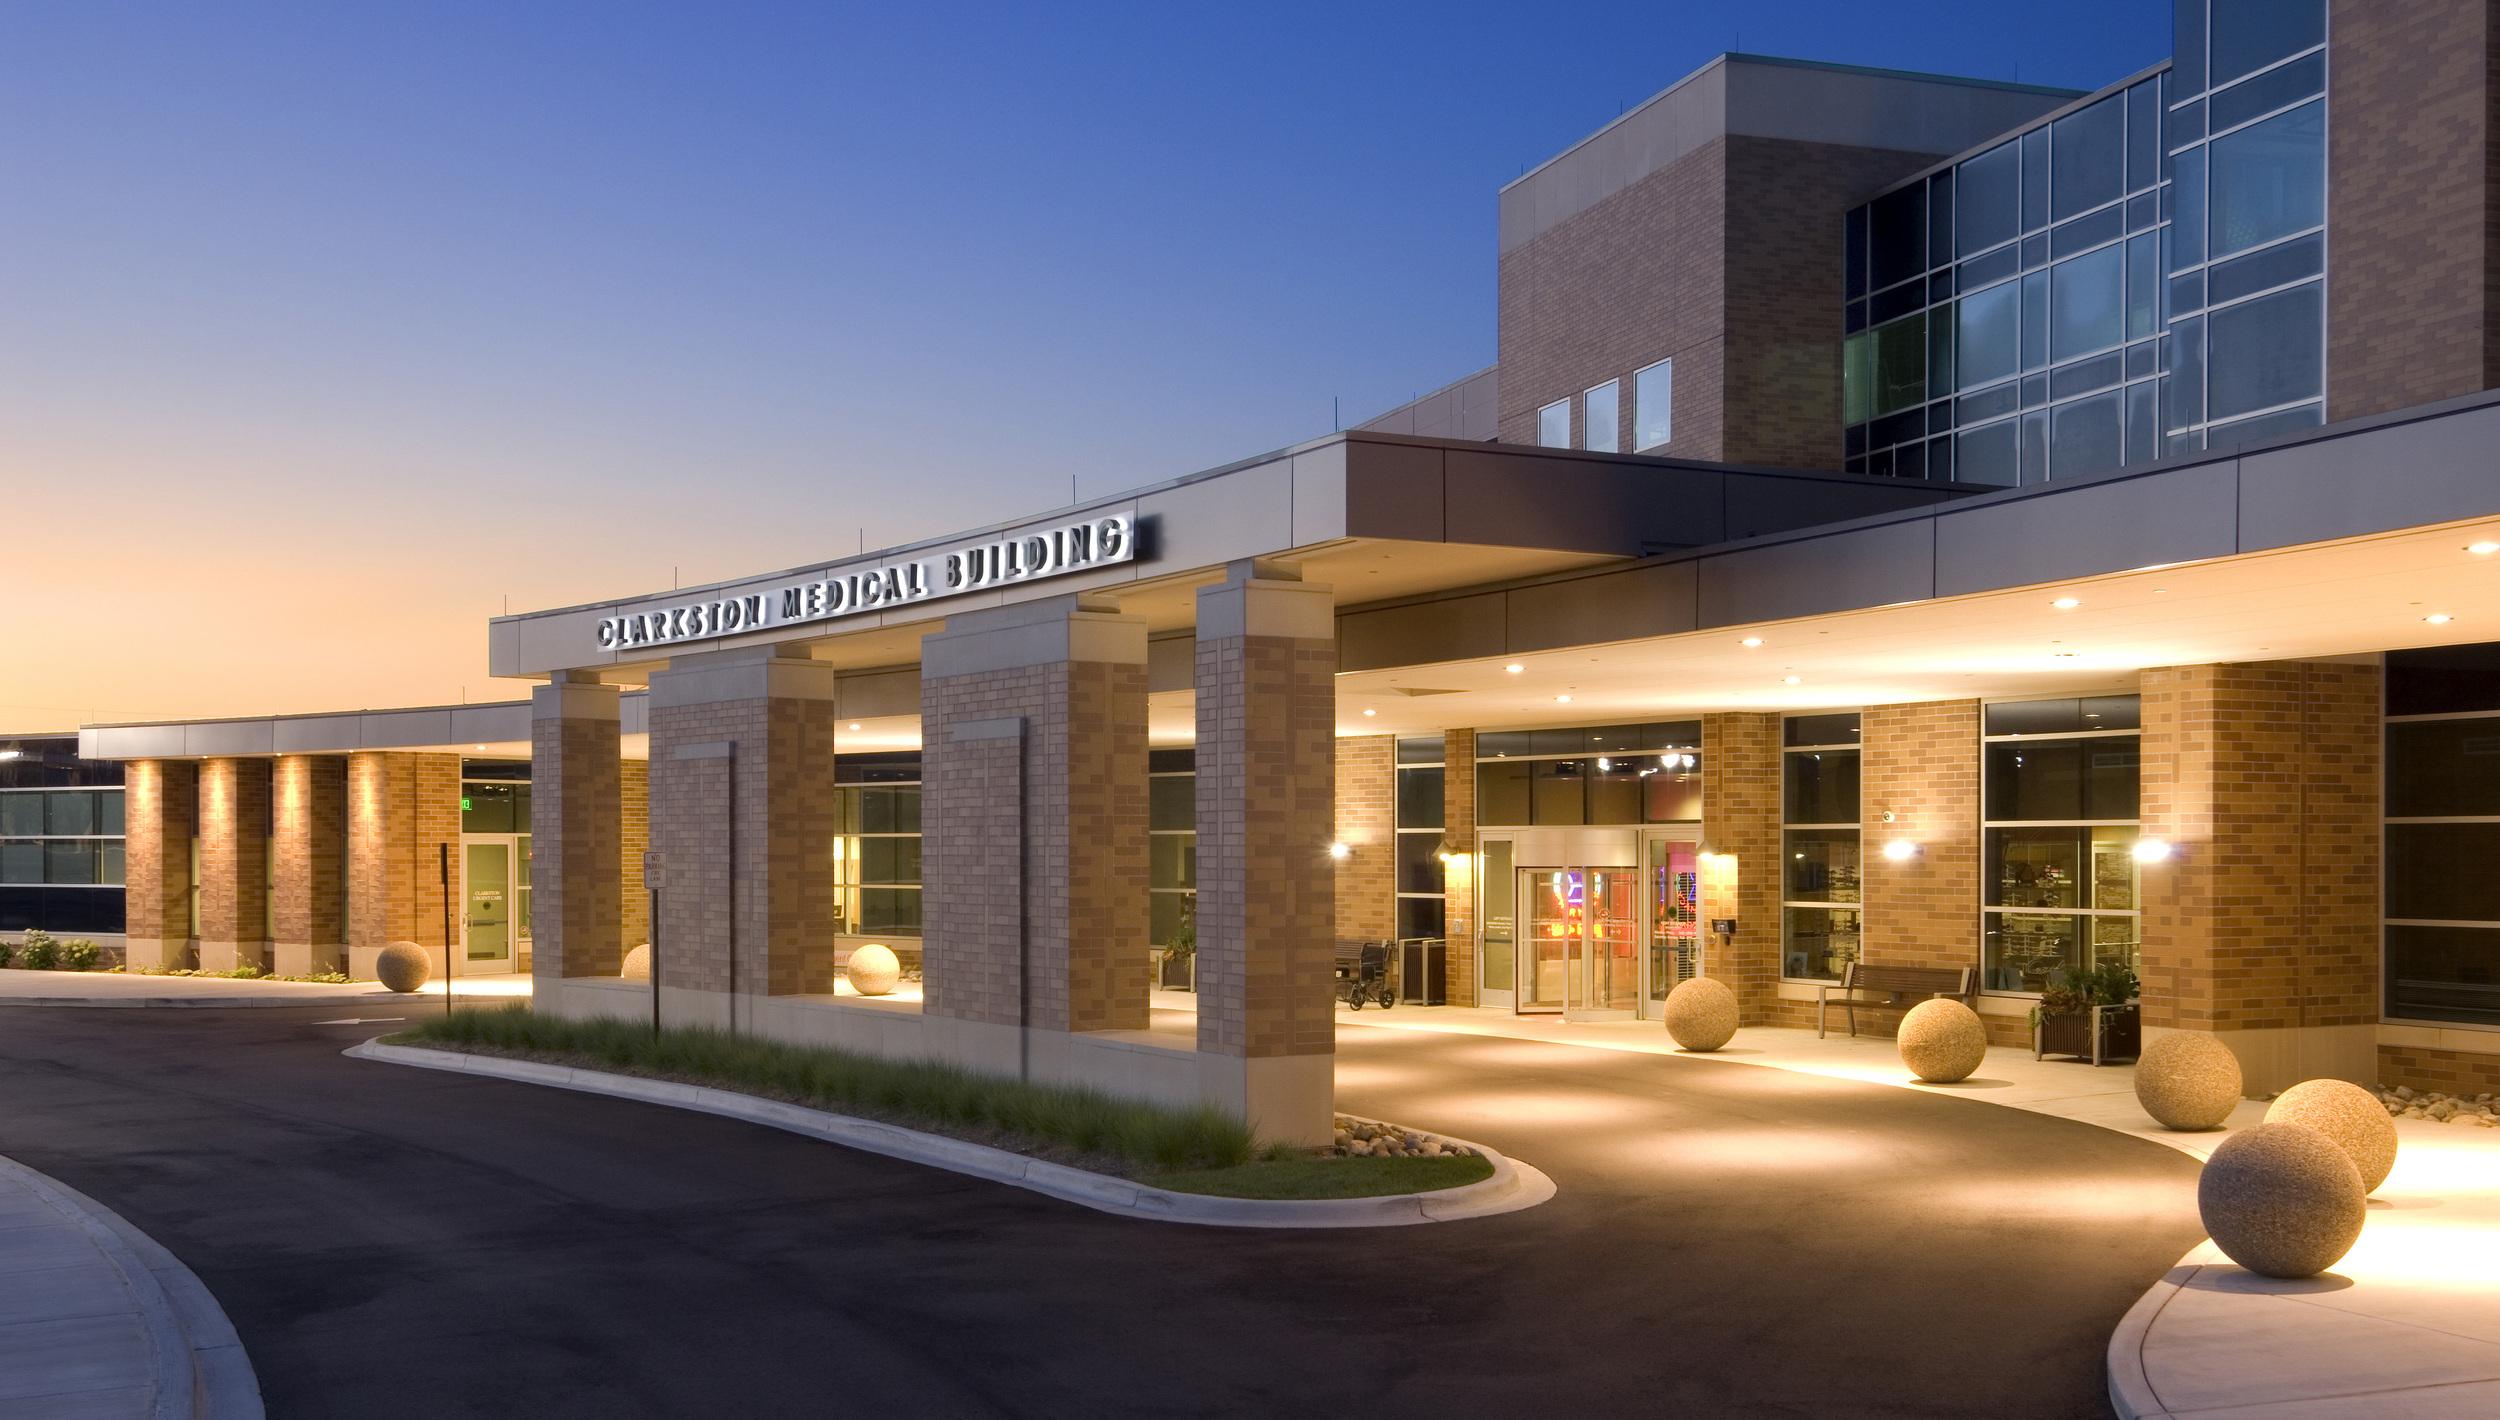 clarkston-medical-building-entrance